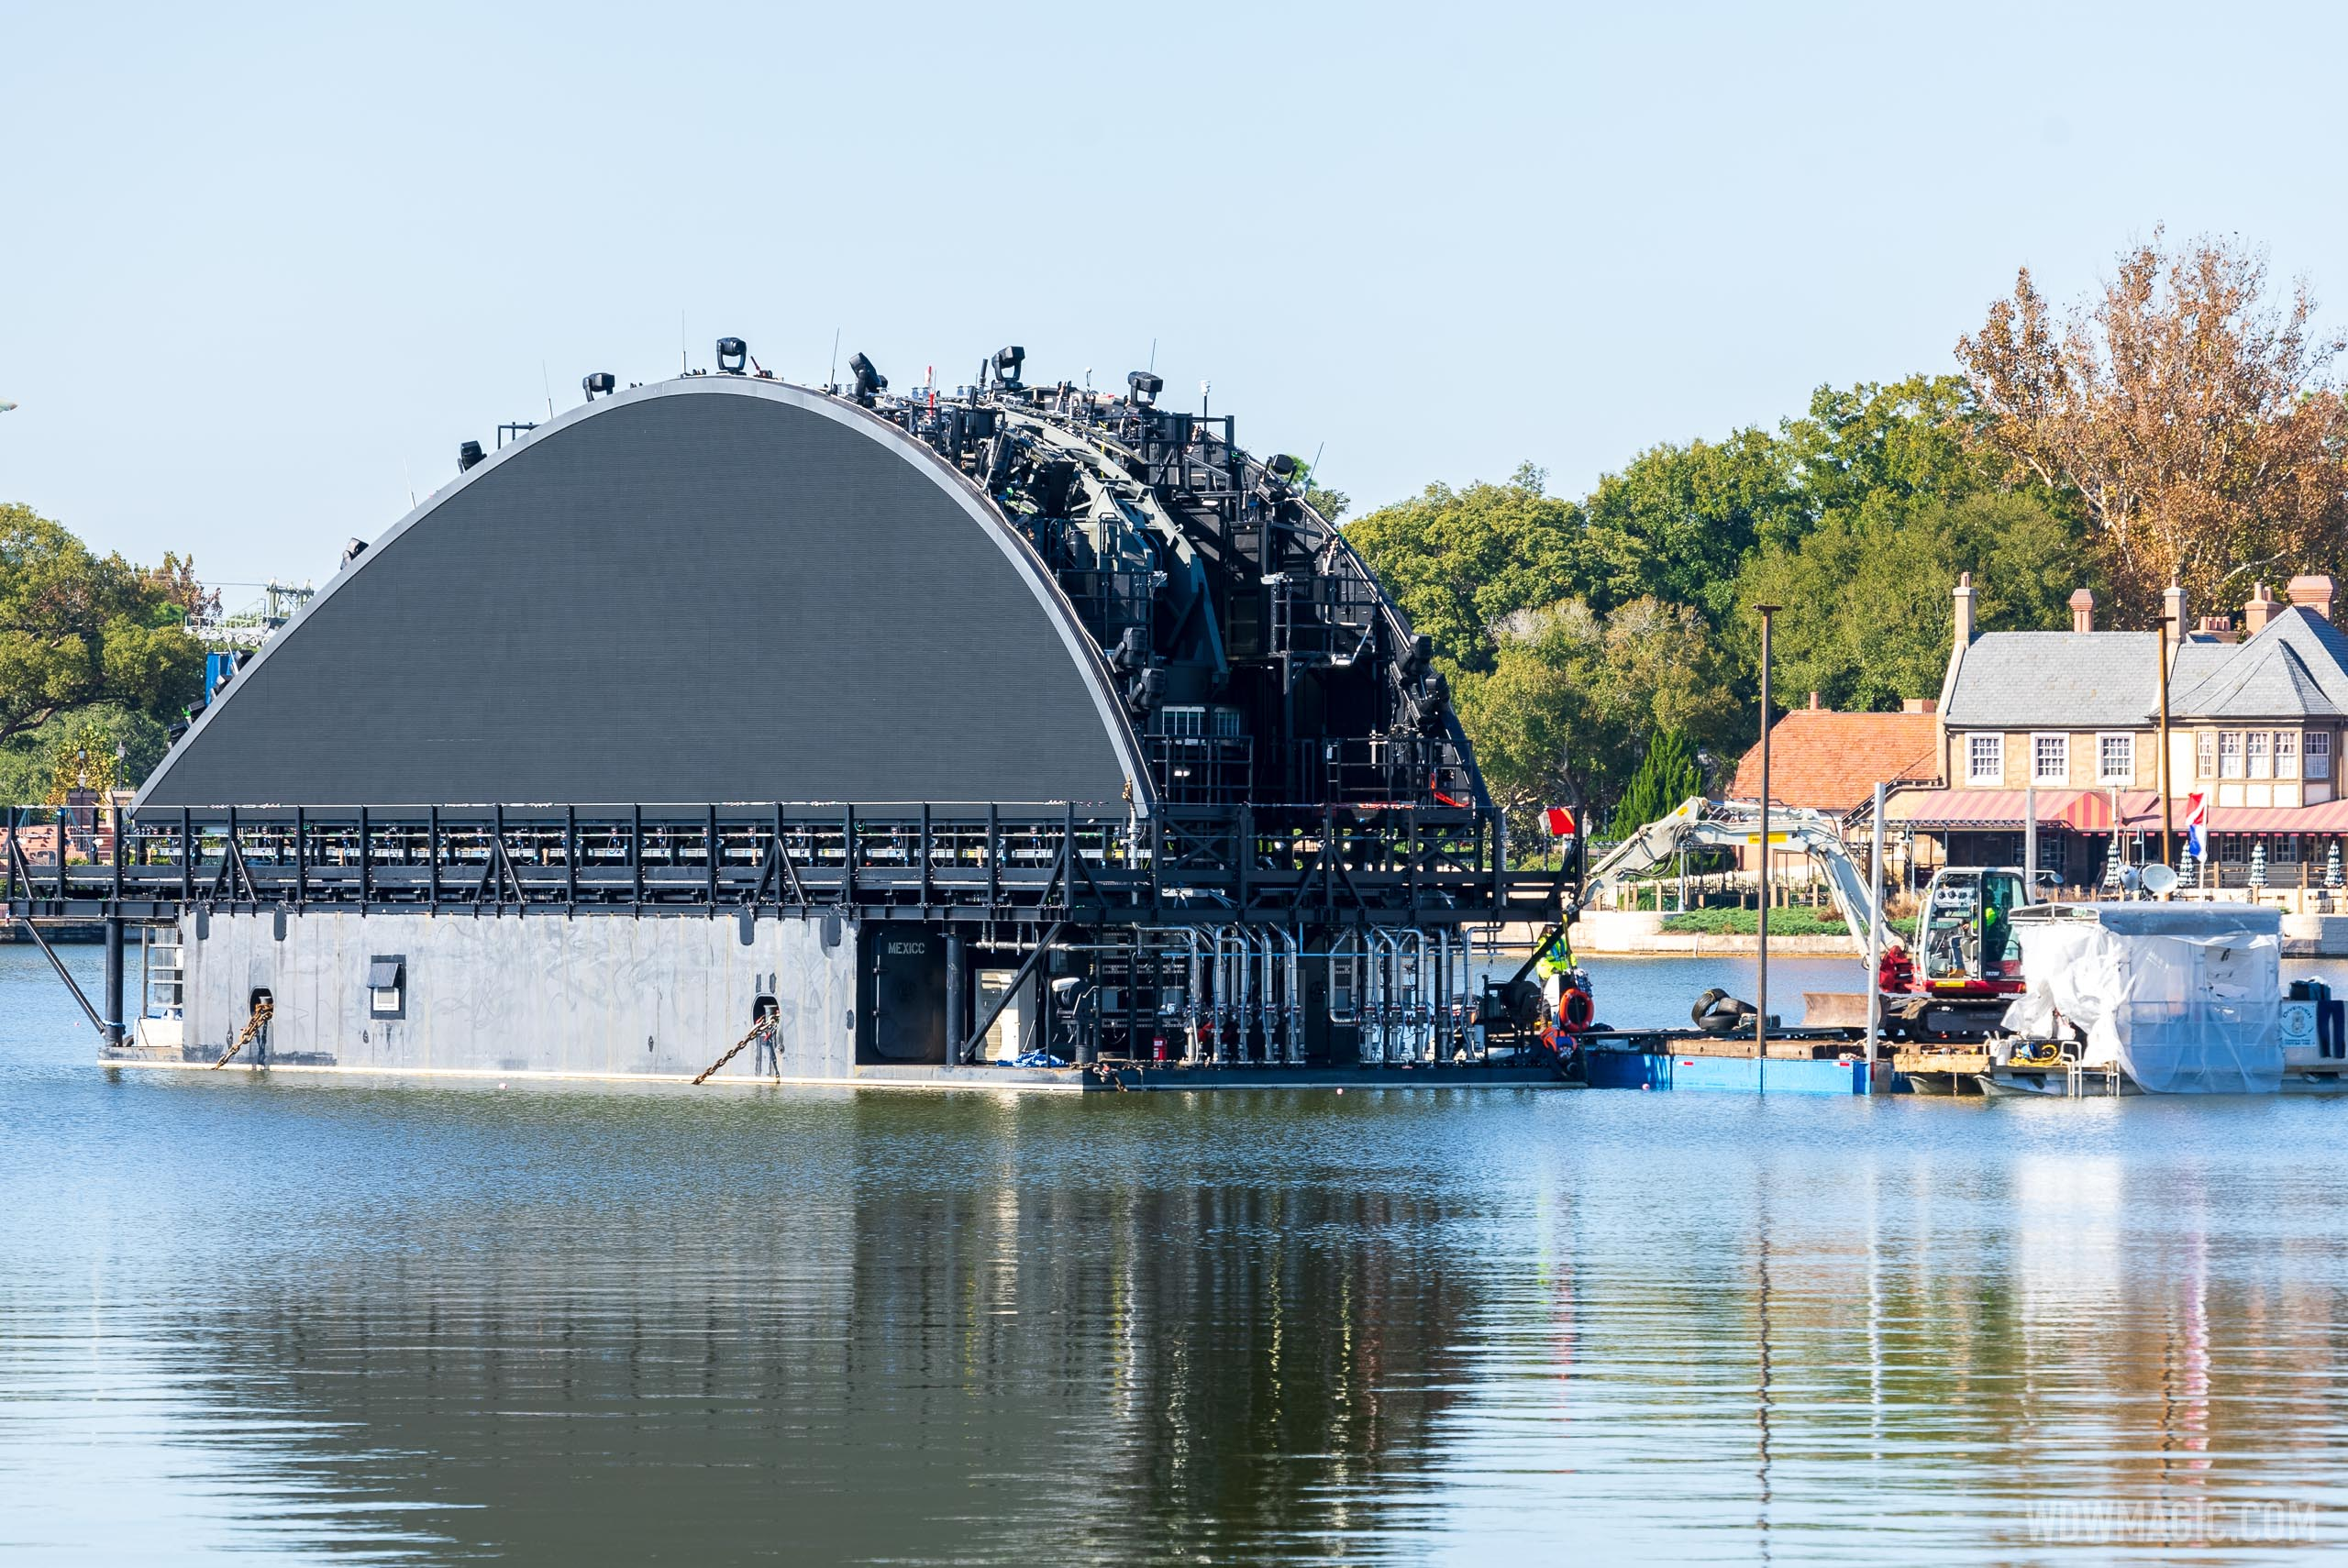 First harmonious show platform barge in World Showcase Lagoon